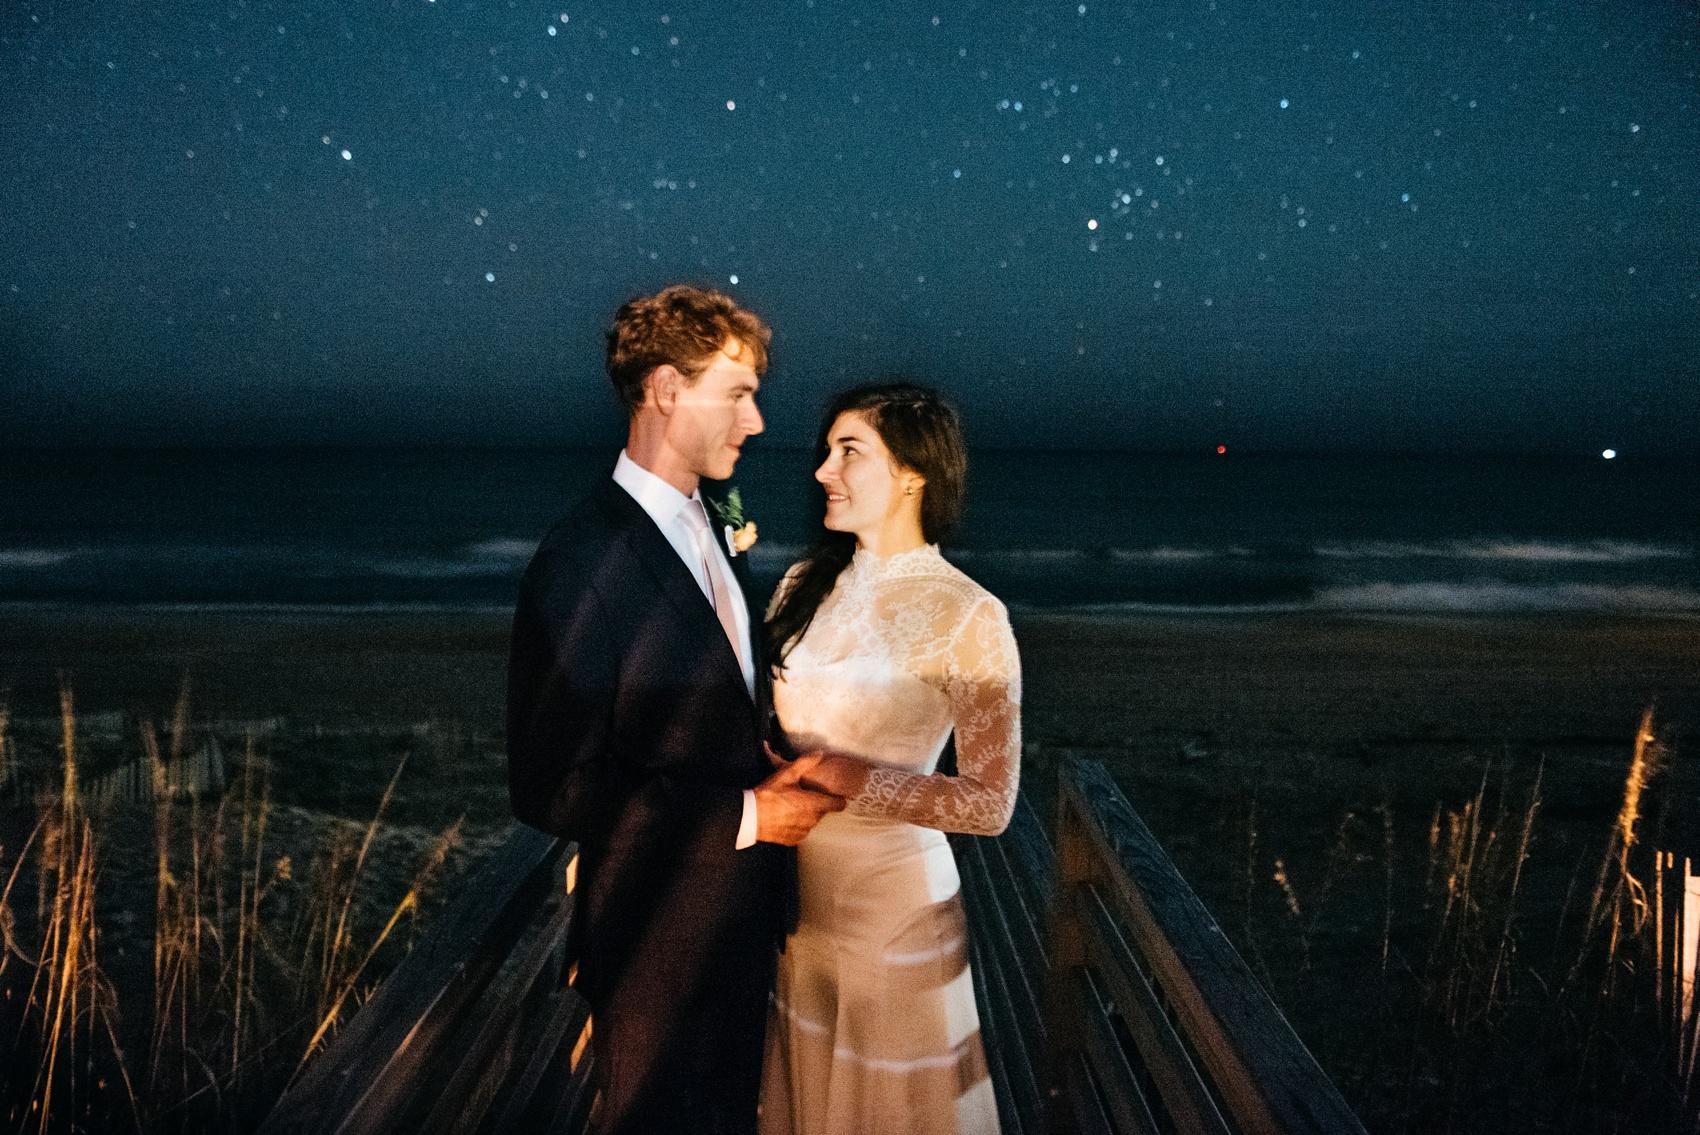 outerbanks_wedding_photographer_1350.jpg